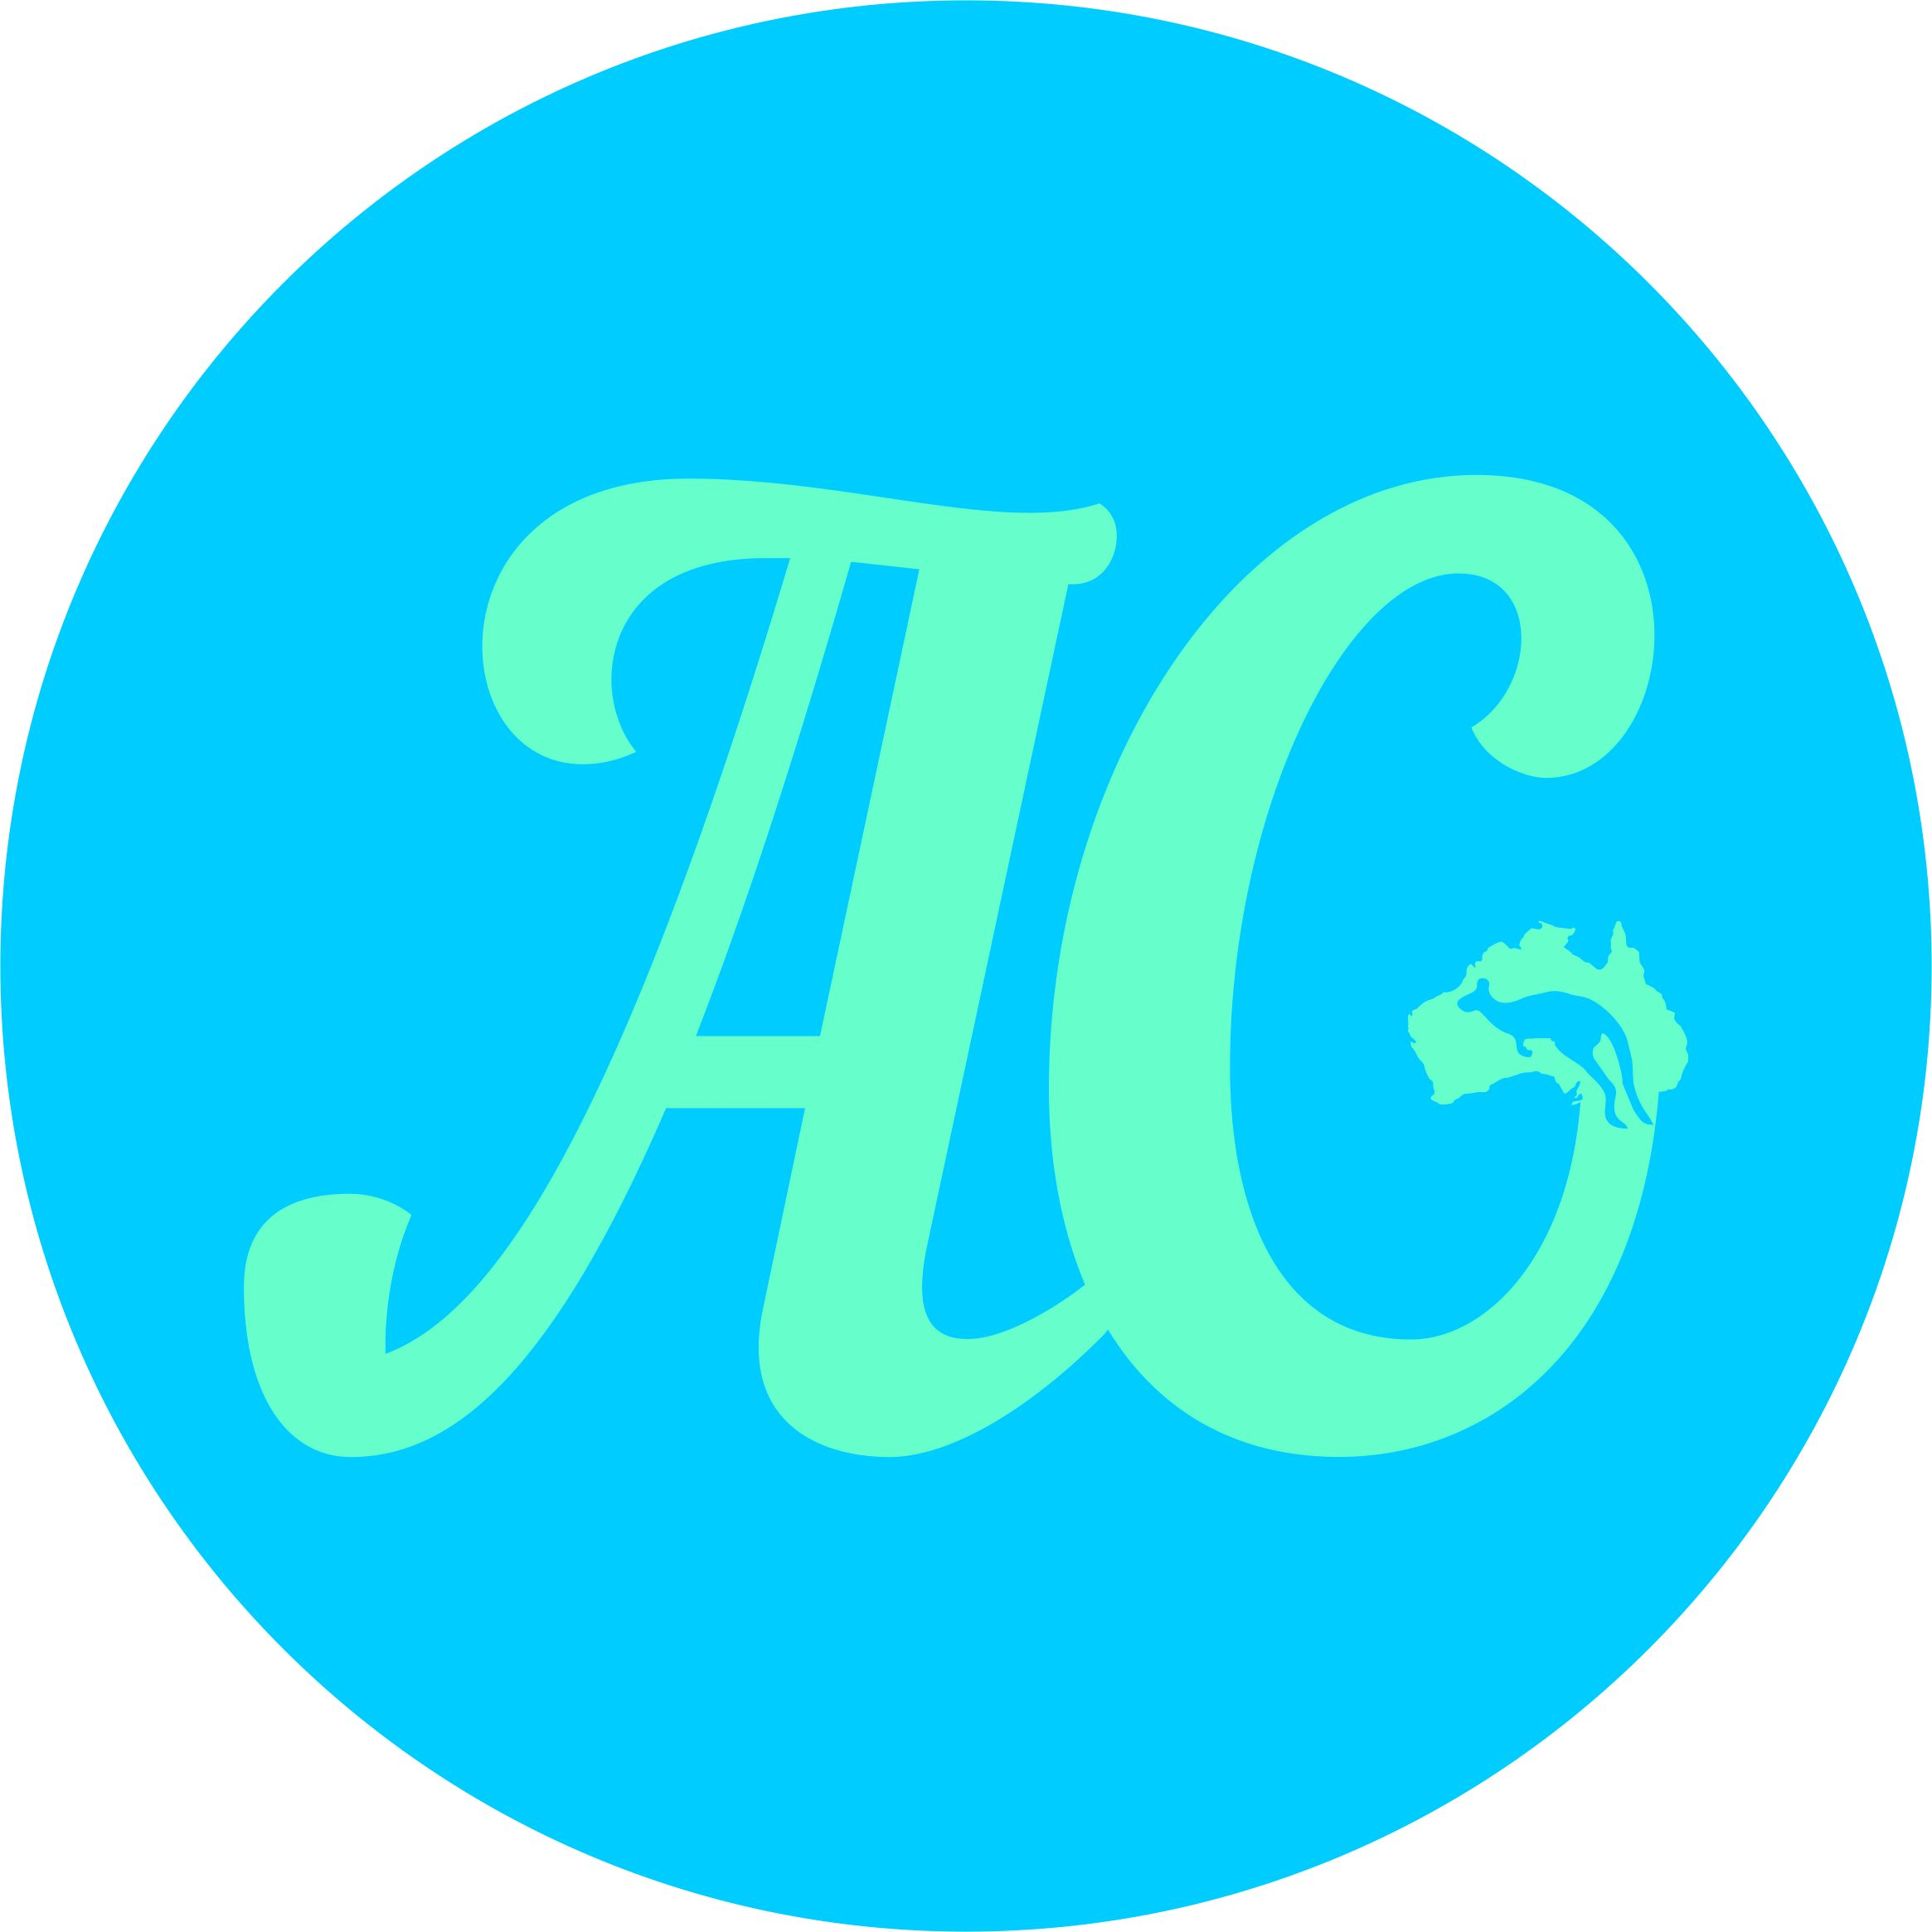 Дизайн логотипа сайта apartment guru - дизайнер trankvi